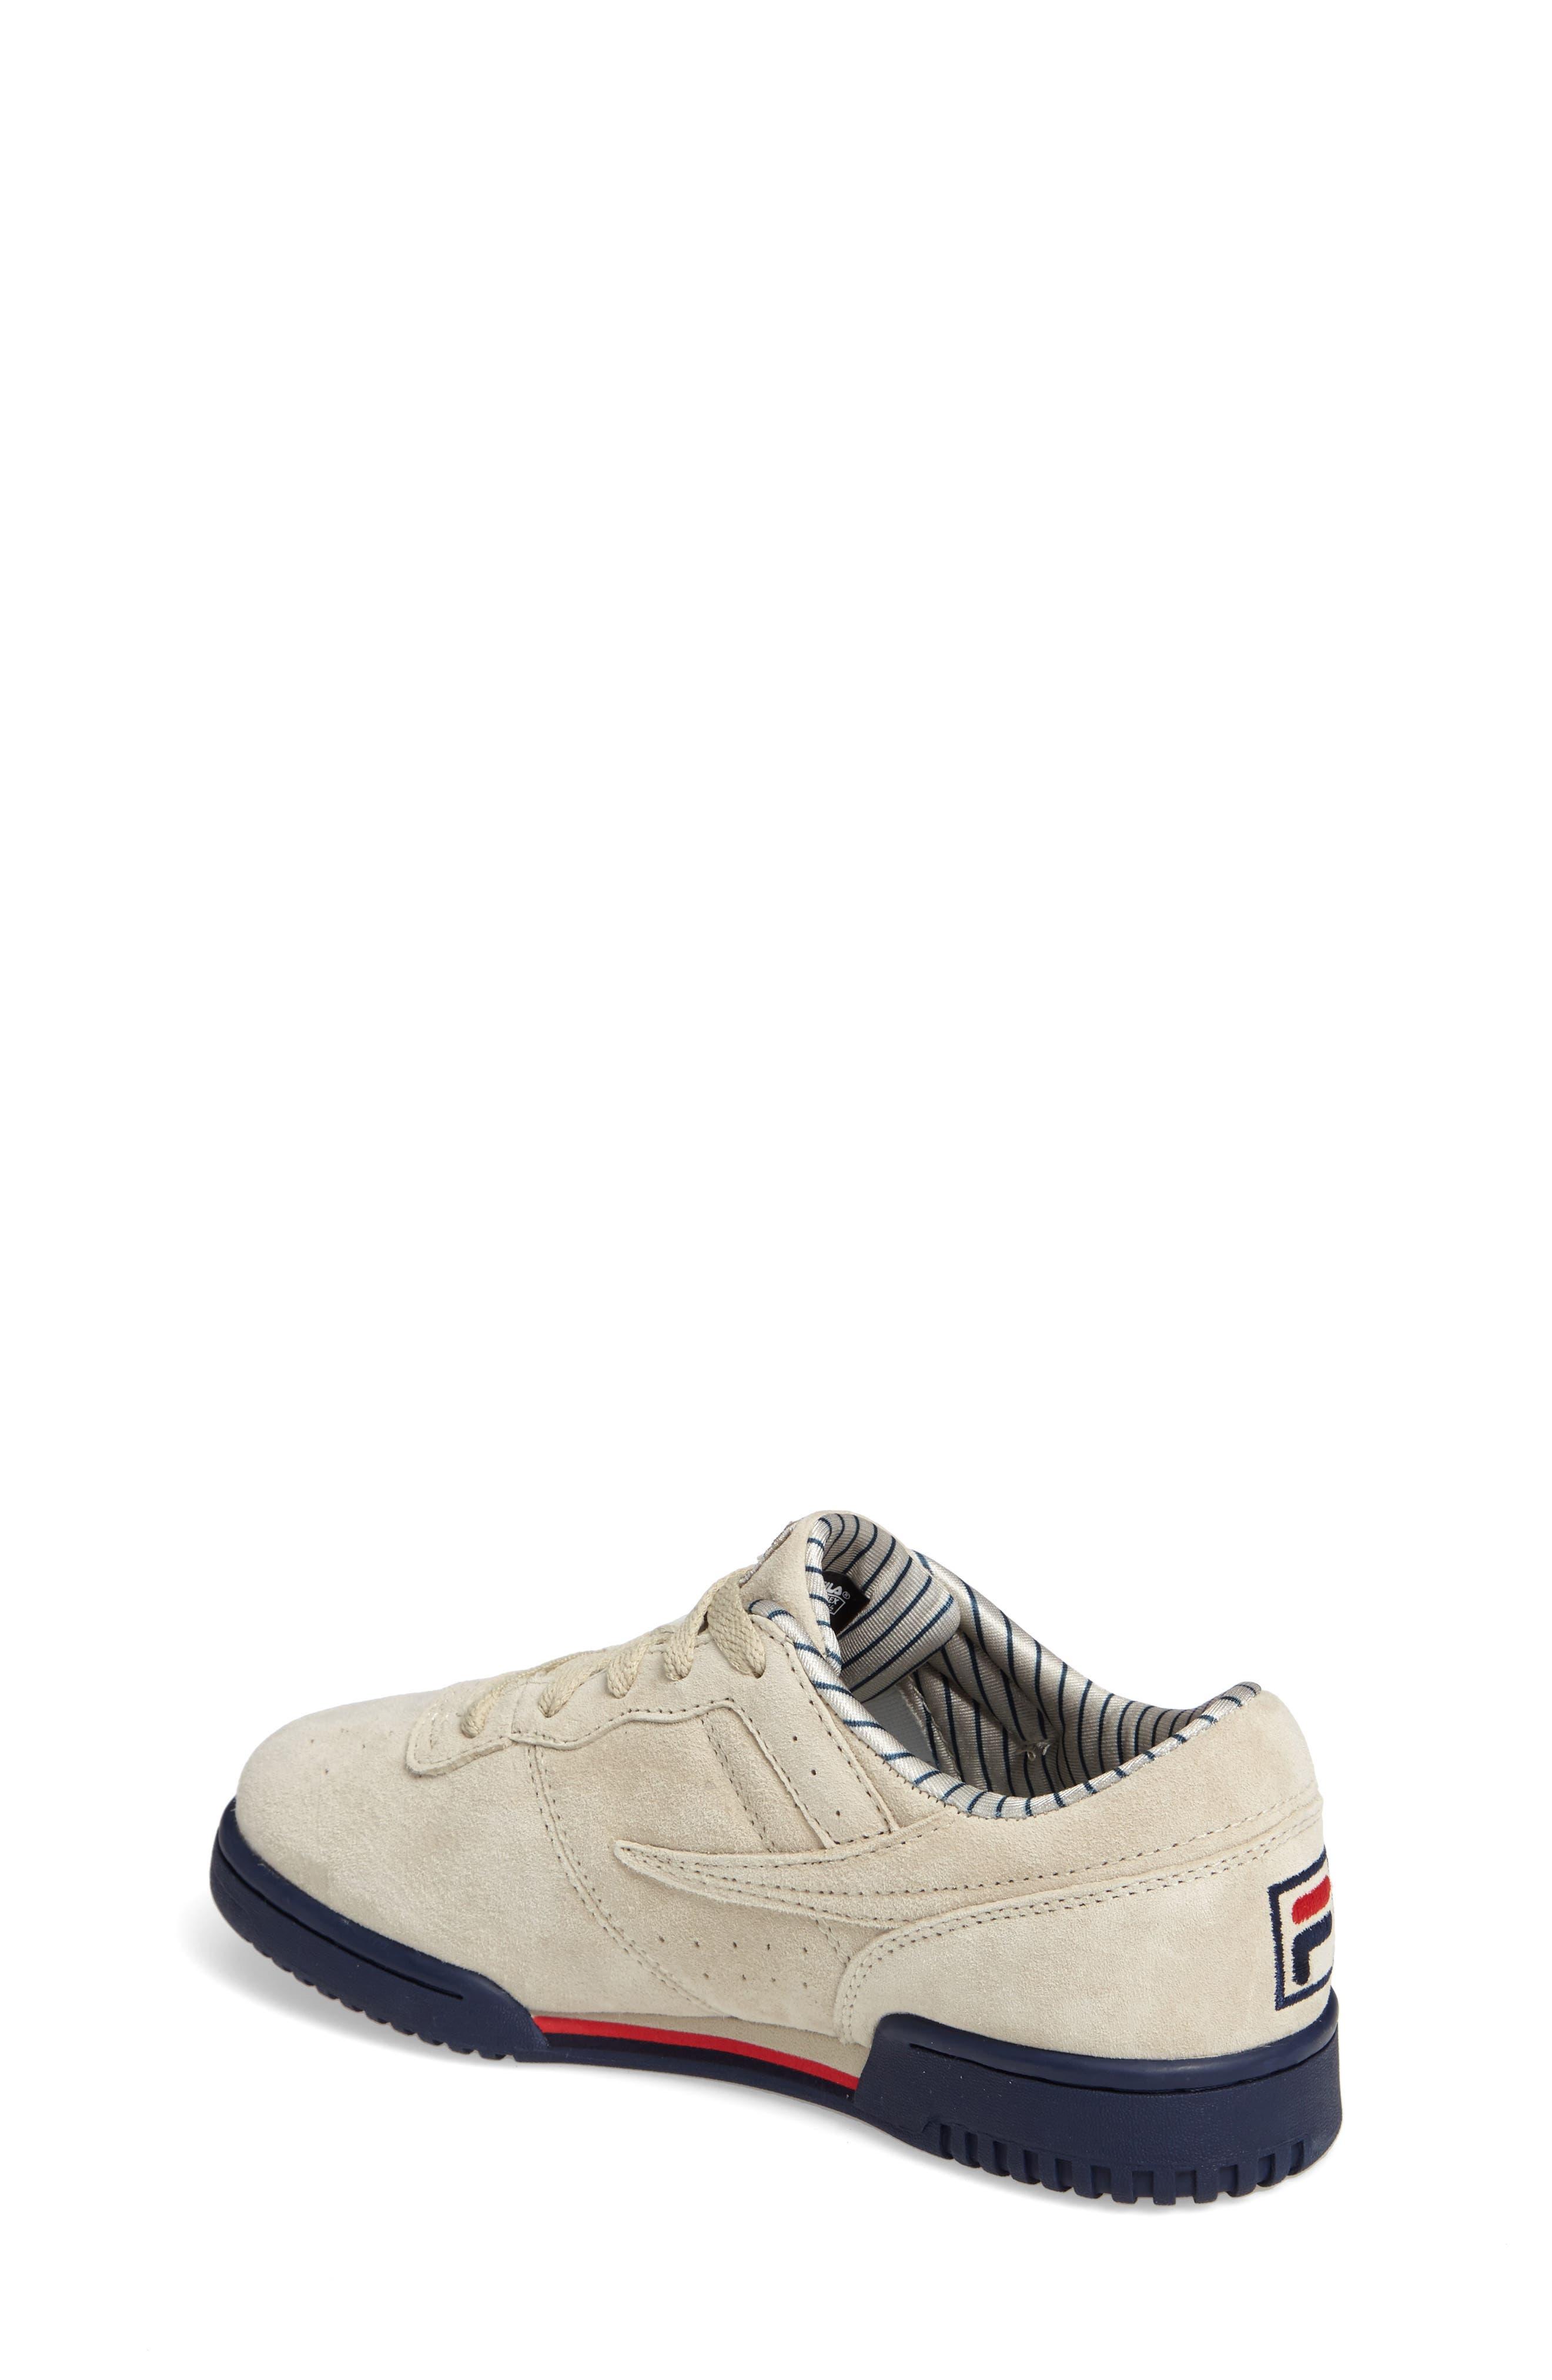 FILA,                             Original Fitness Sneaker,                             Alternate thumbnail 2, color,                             900